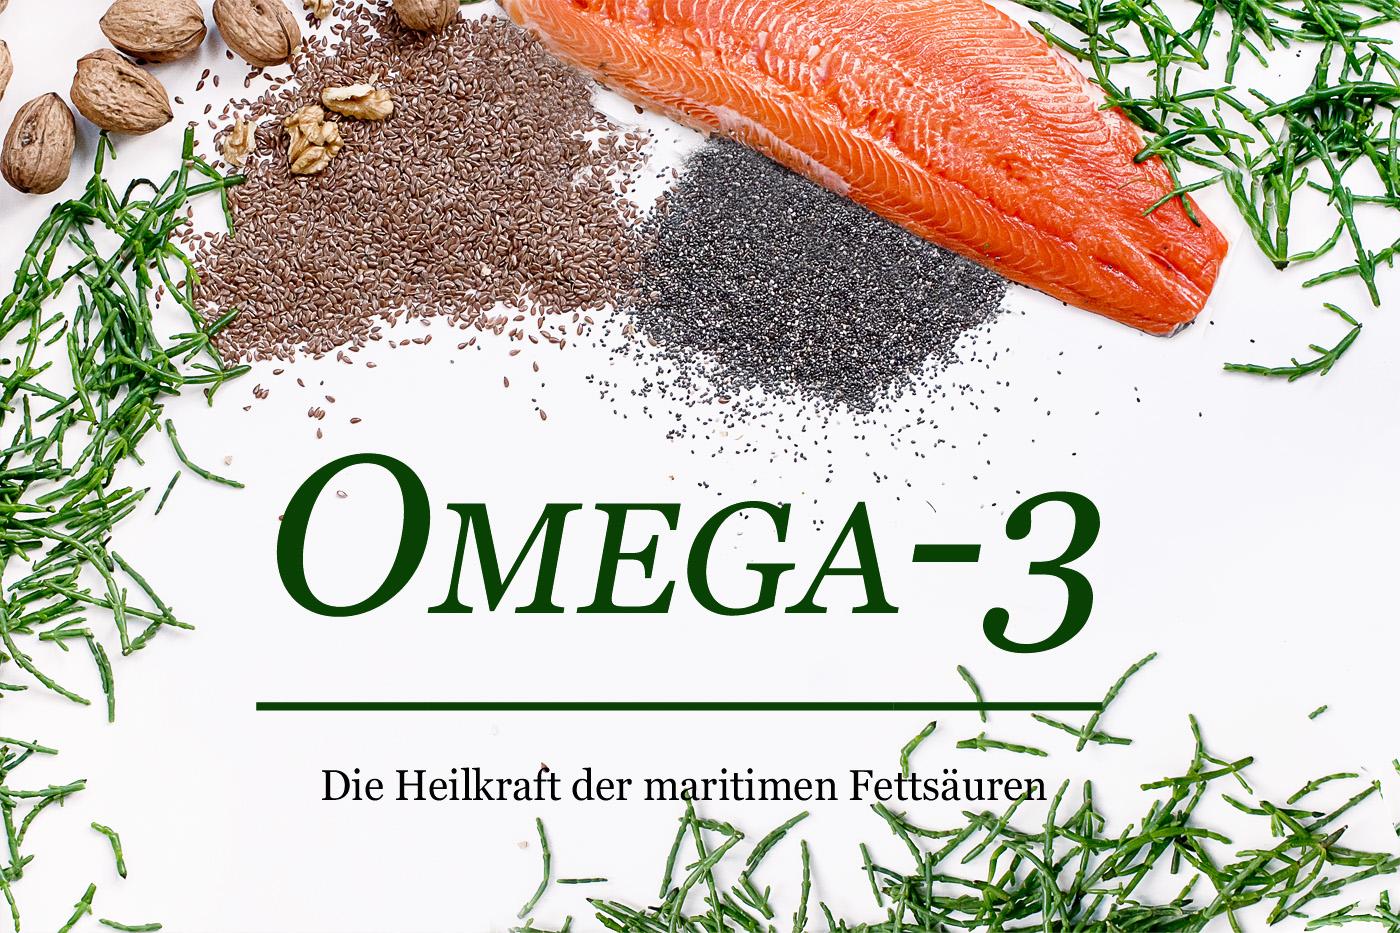 Health: Omega-3 Teil I